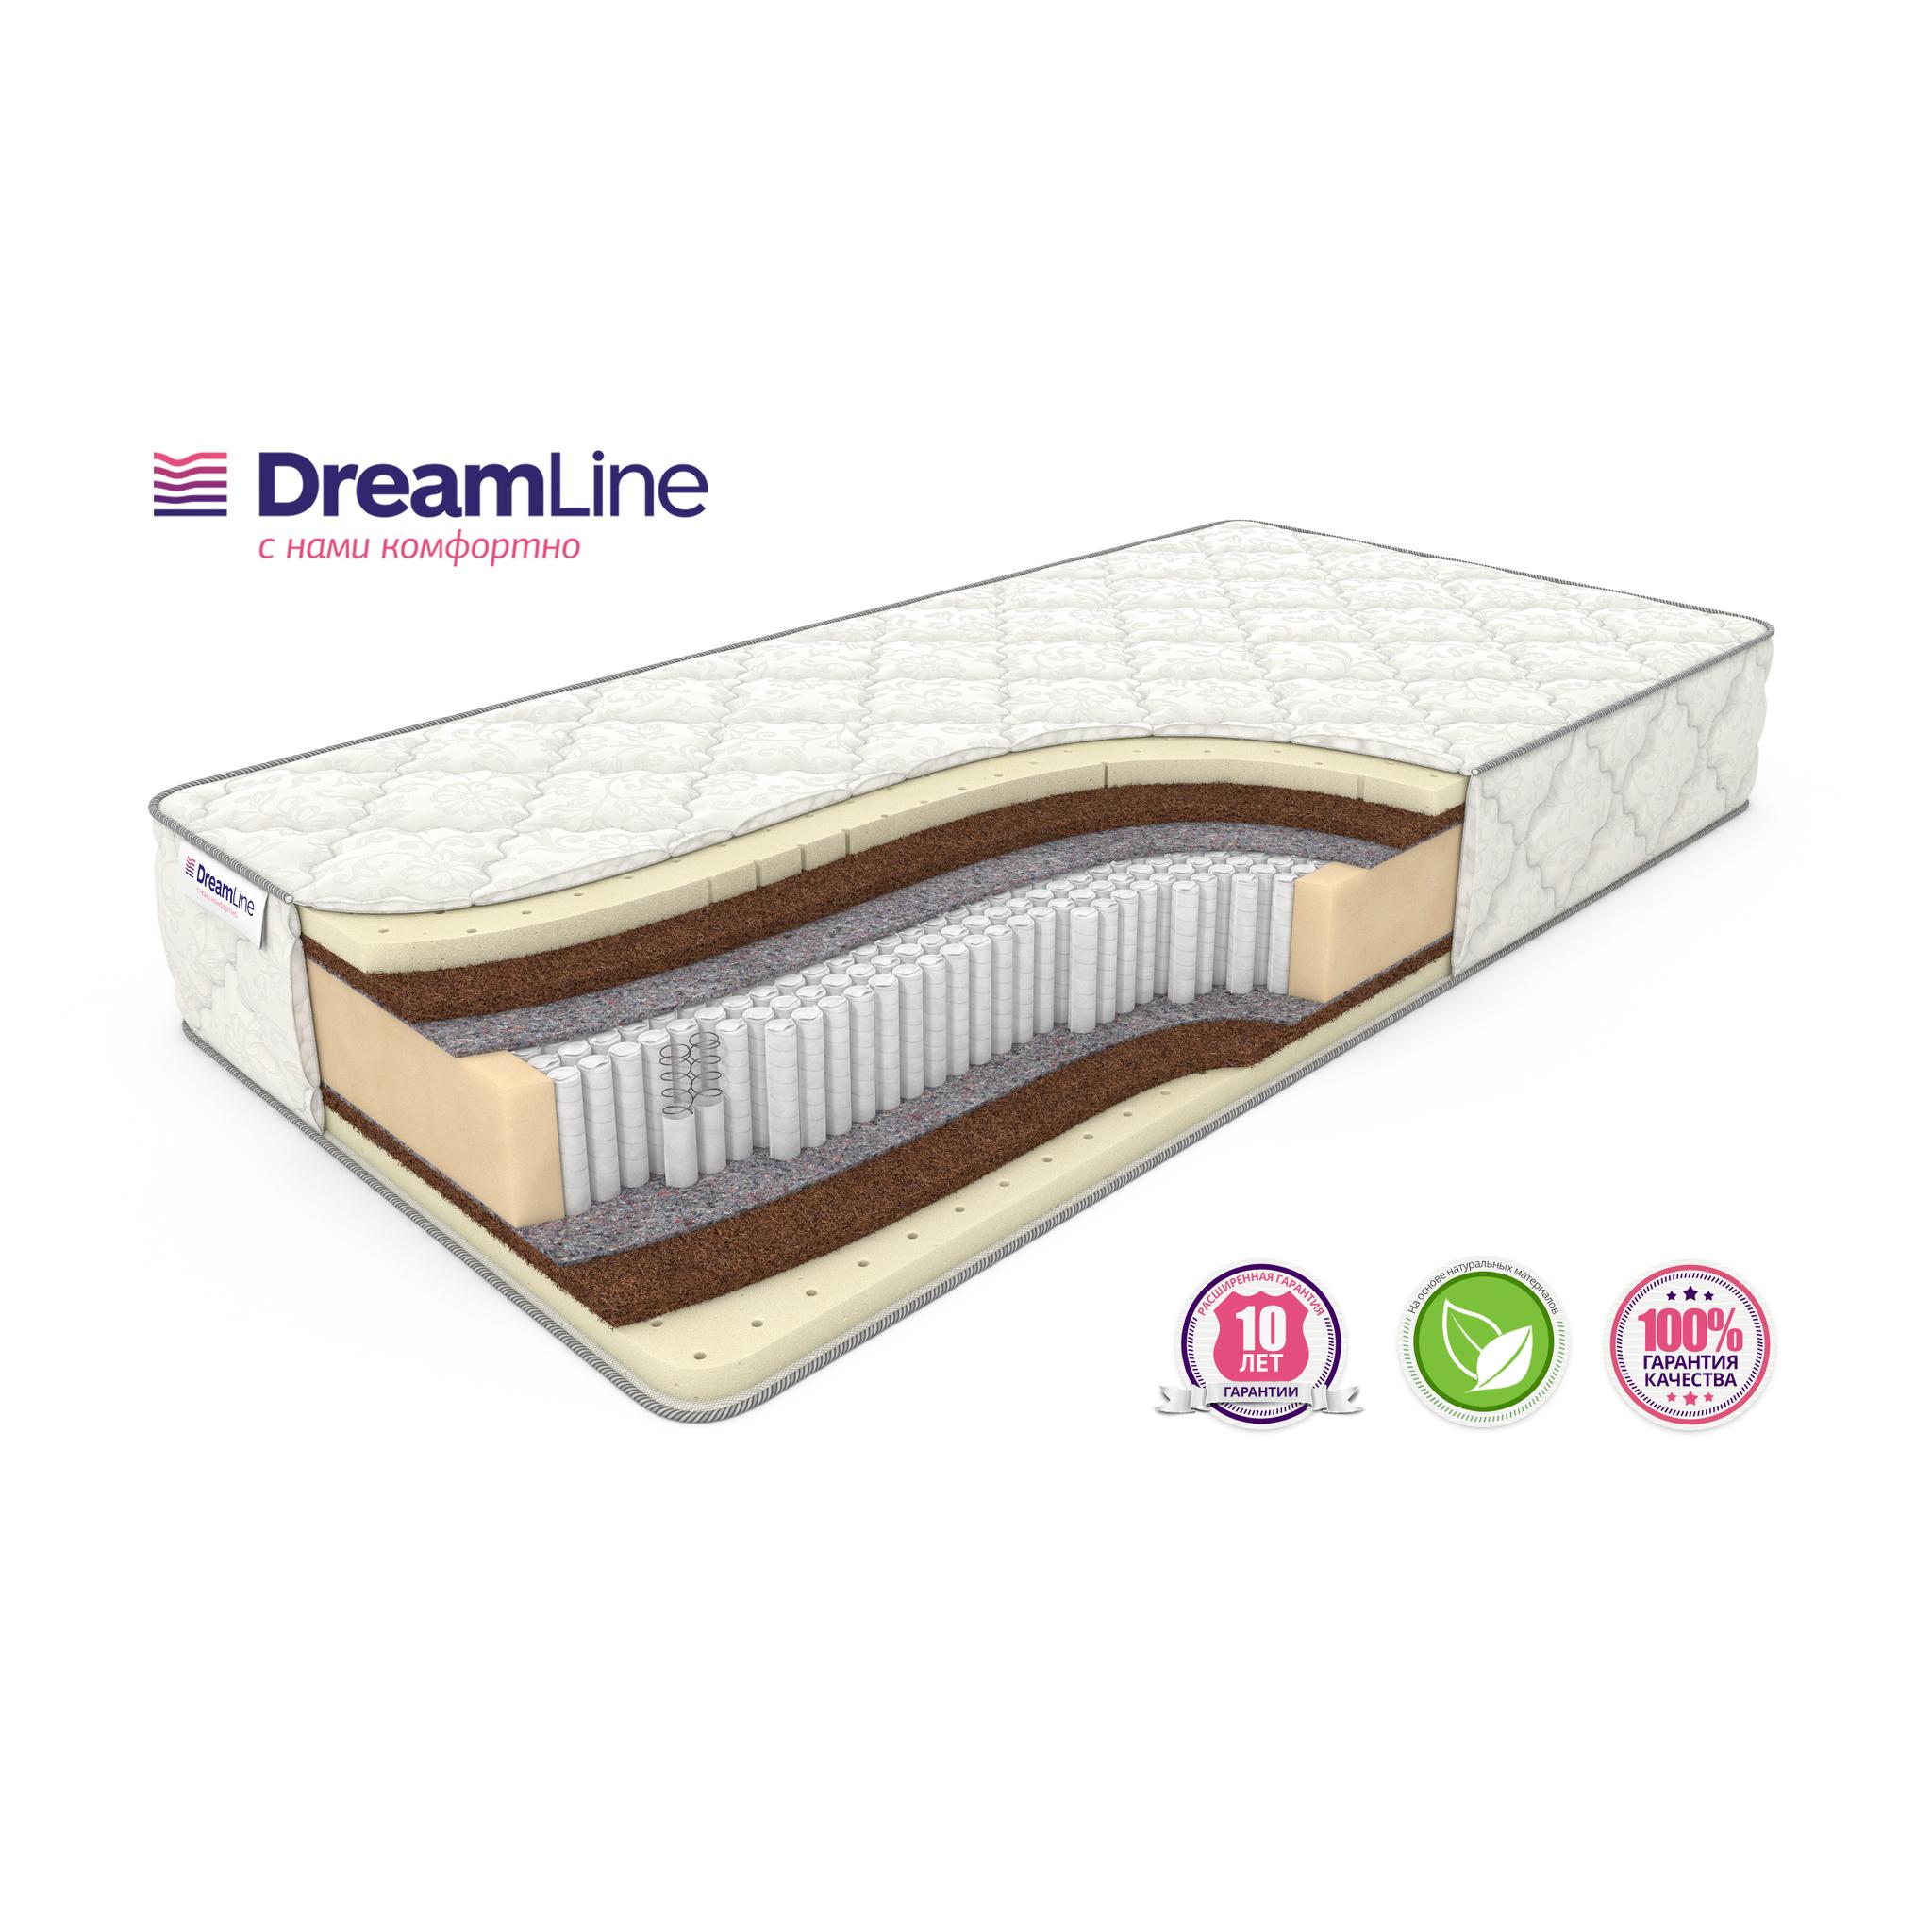 Матрас DreamLine Prime Medium S2000 (120x195) фото